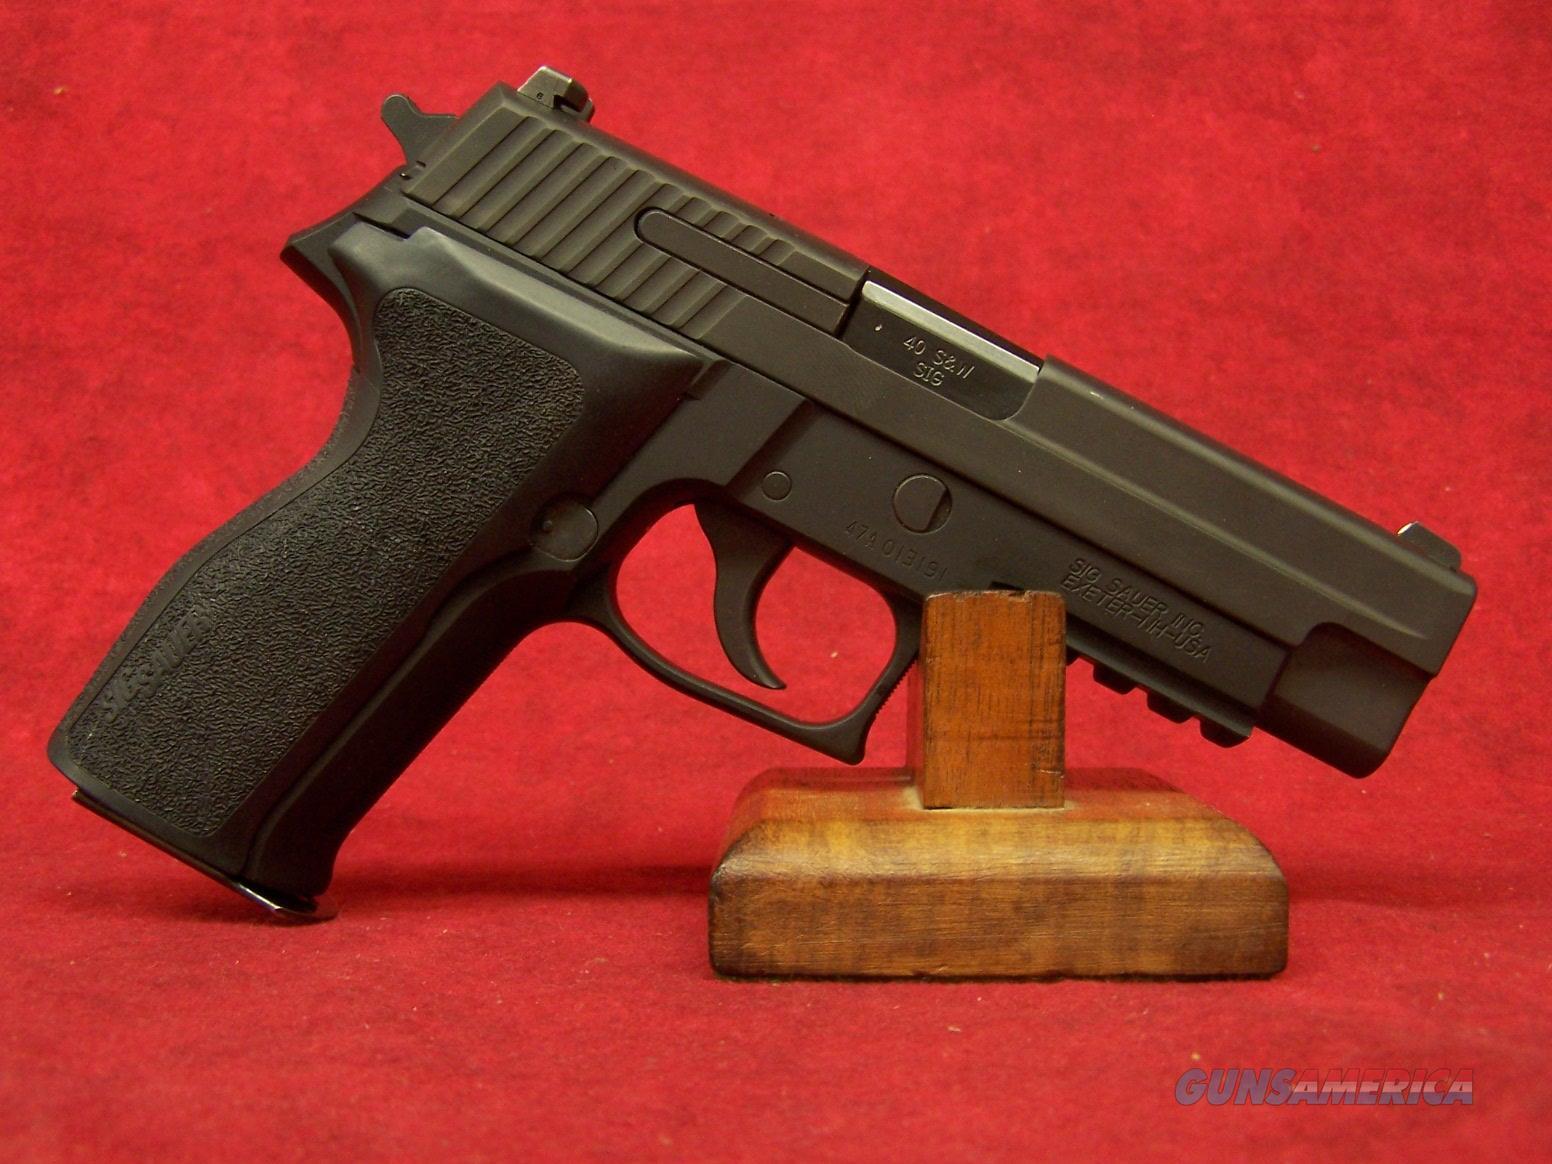 "Sig Sauer P226 .40 S&W 4.4"" Barrel  Guns > Pistols > Sig - Sauer/Sigarms Pistols > P226"